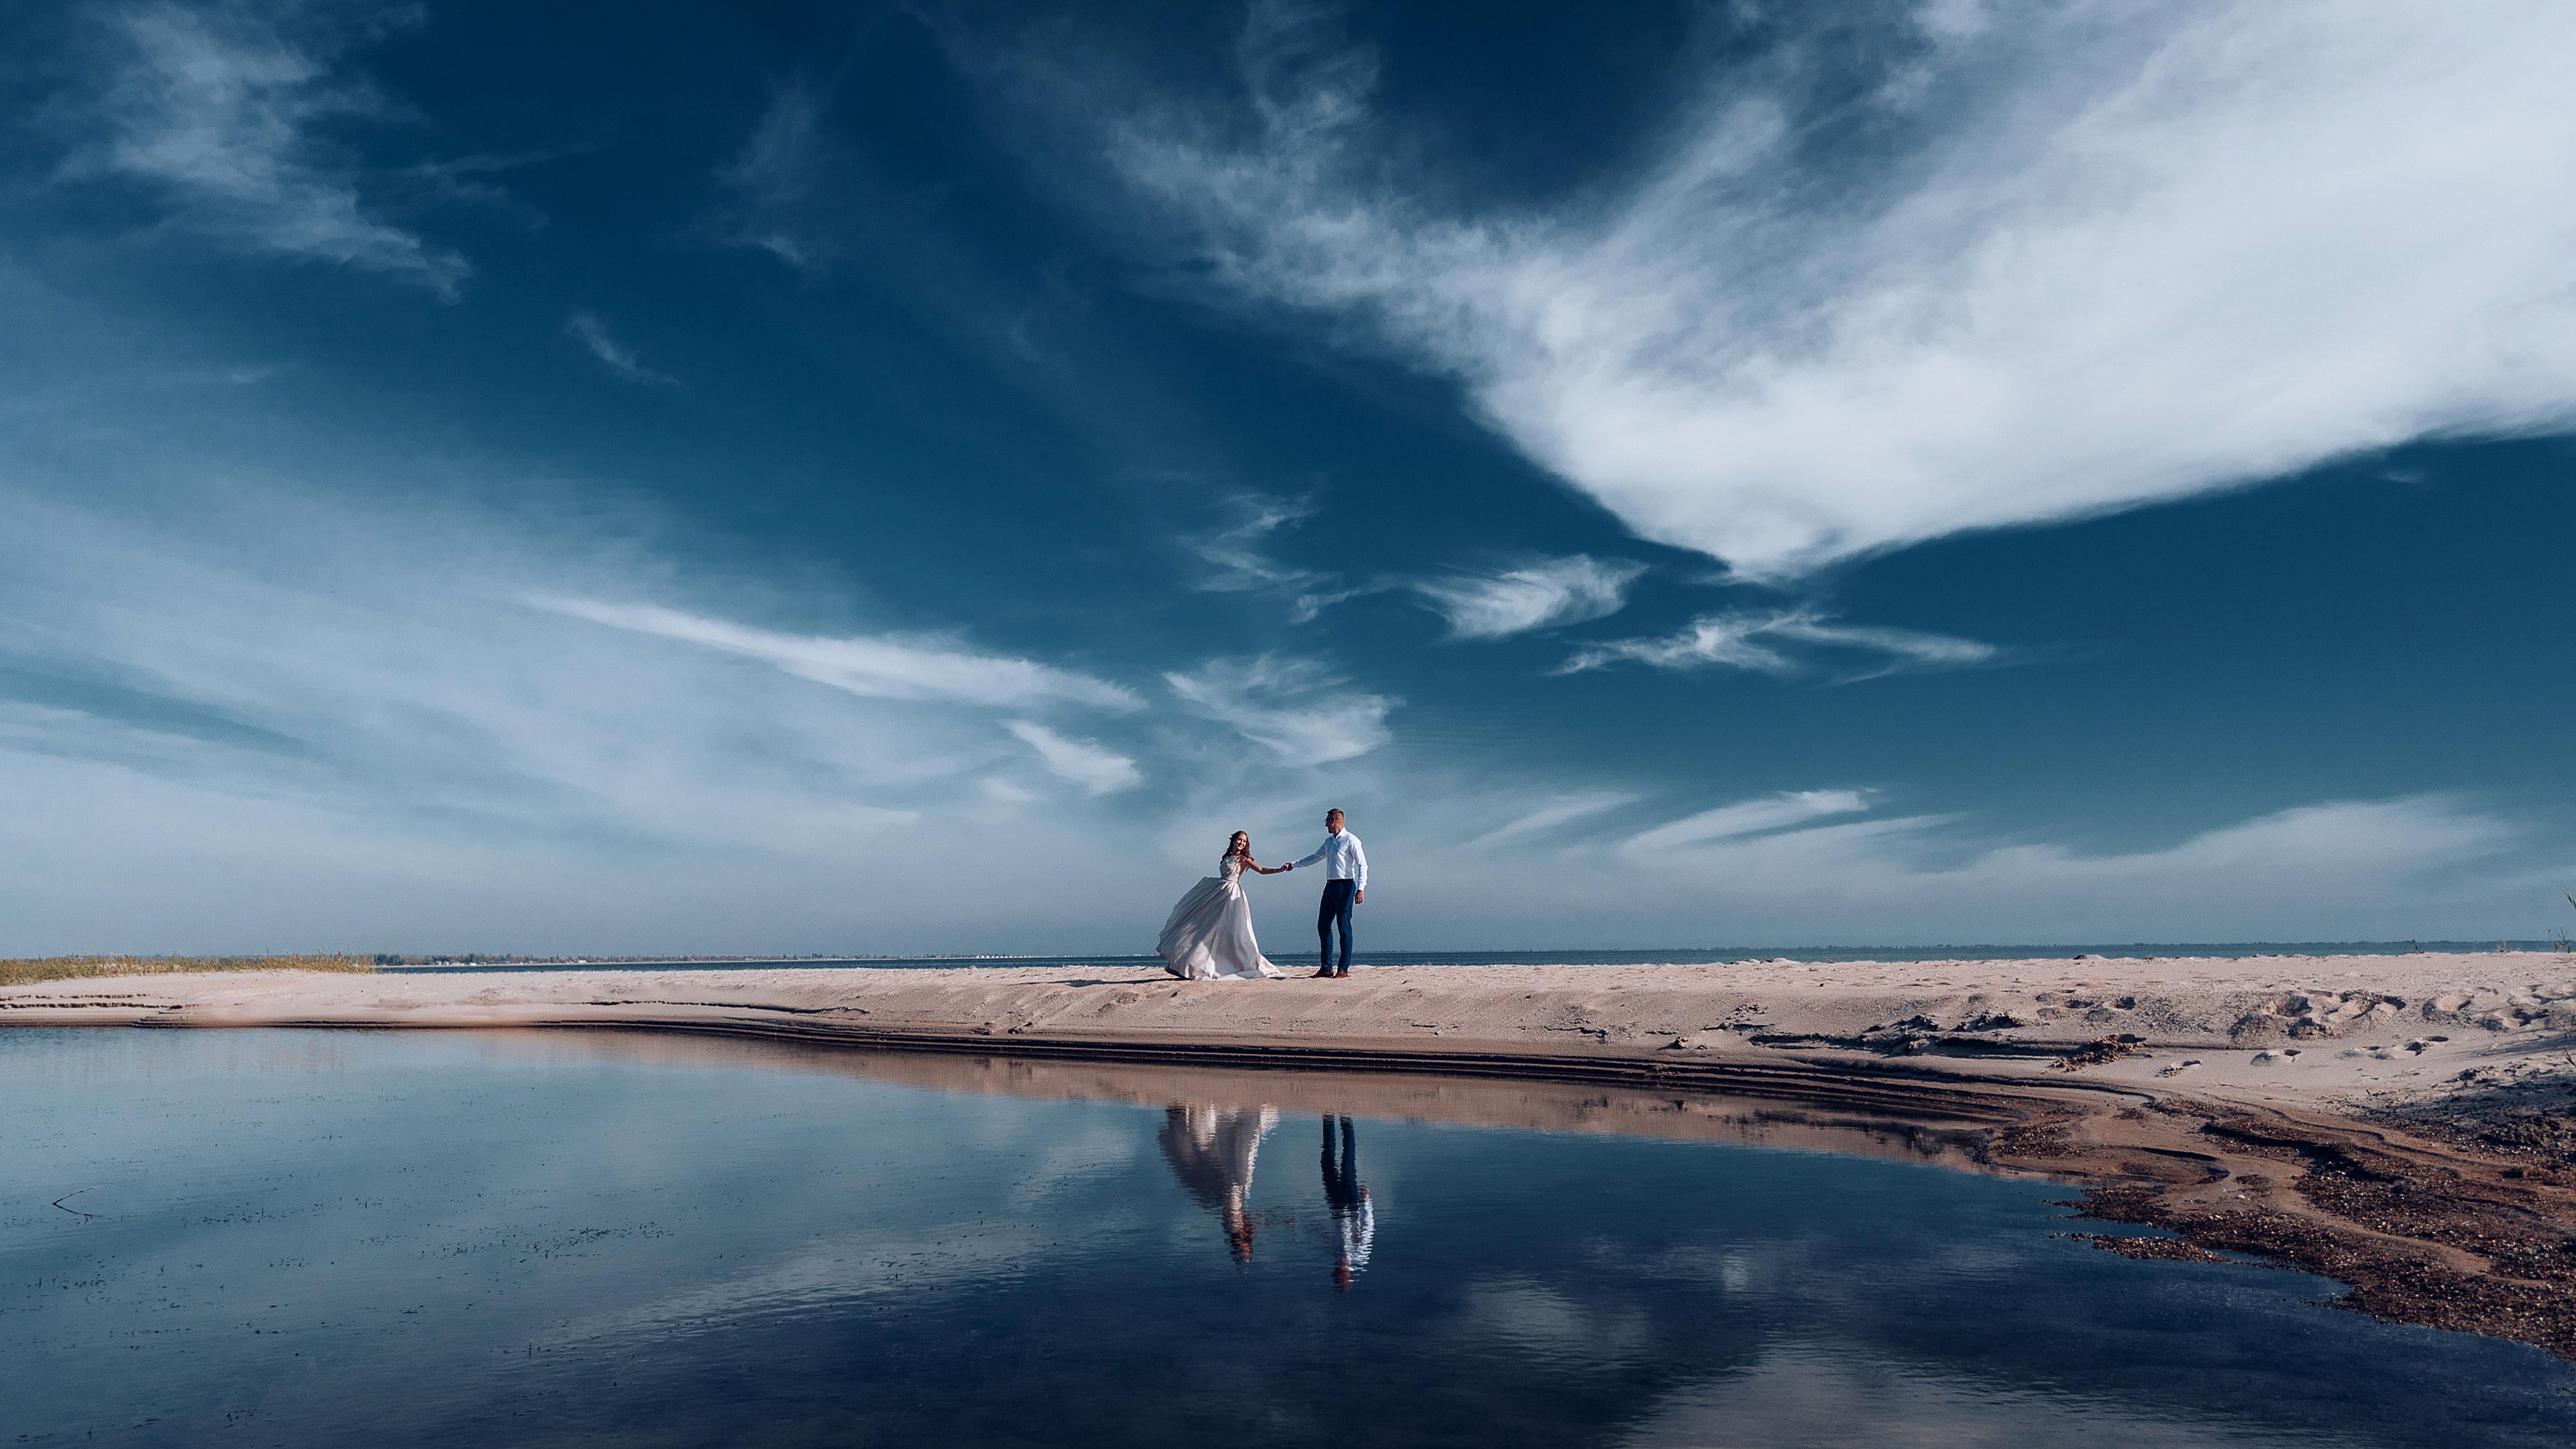 Contate Wedding Photographer Los Angeles, Huntington beach - California, Ricardo Da Costa.